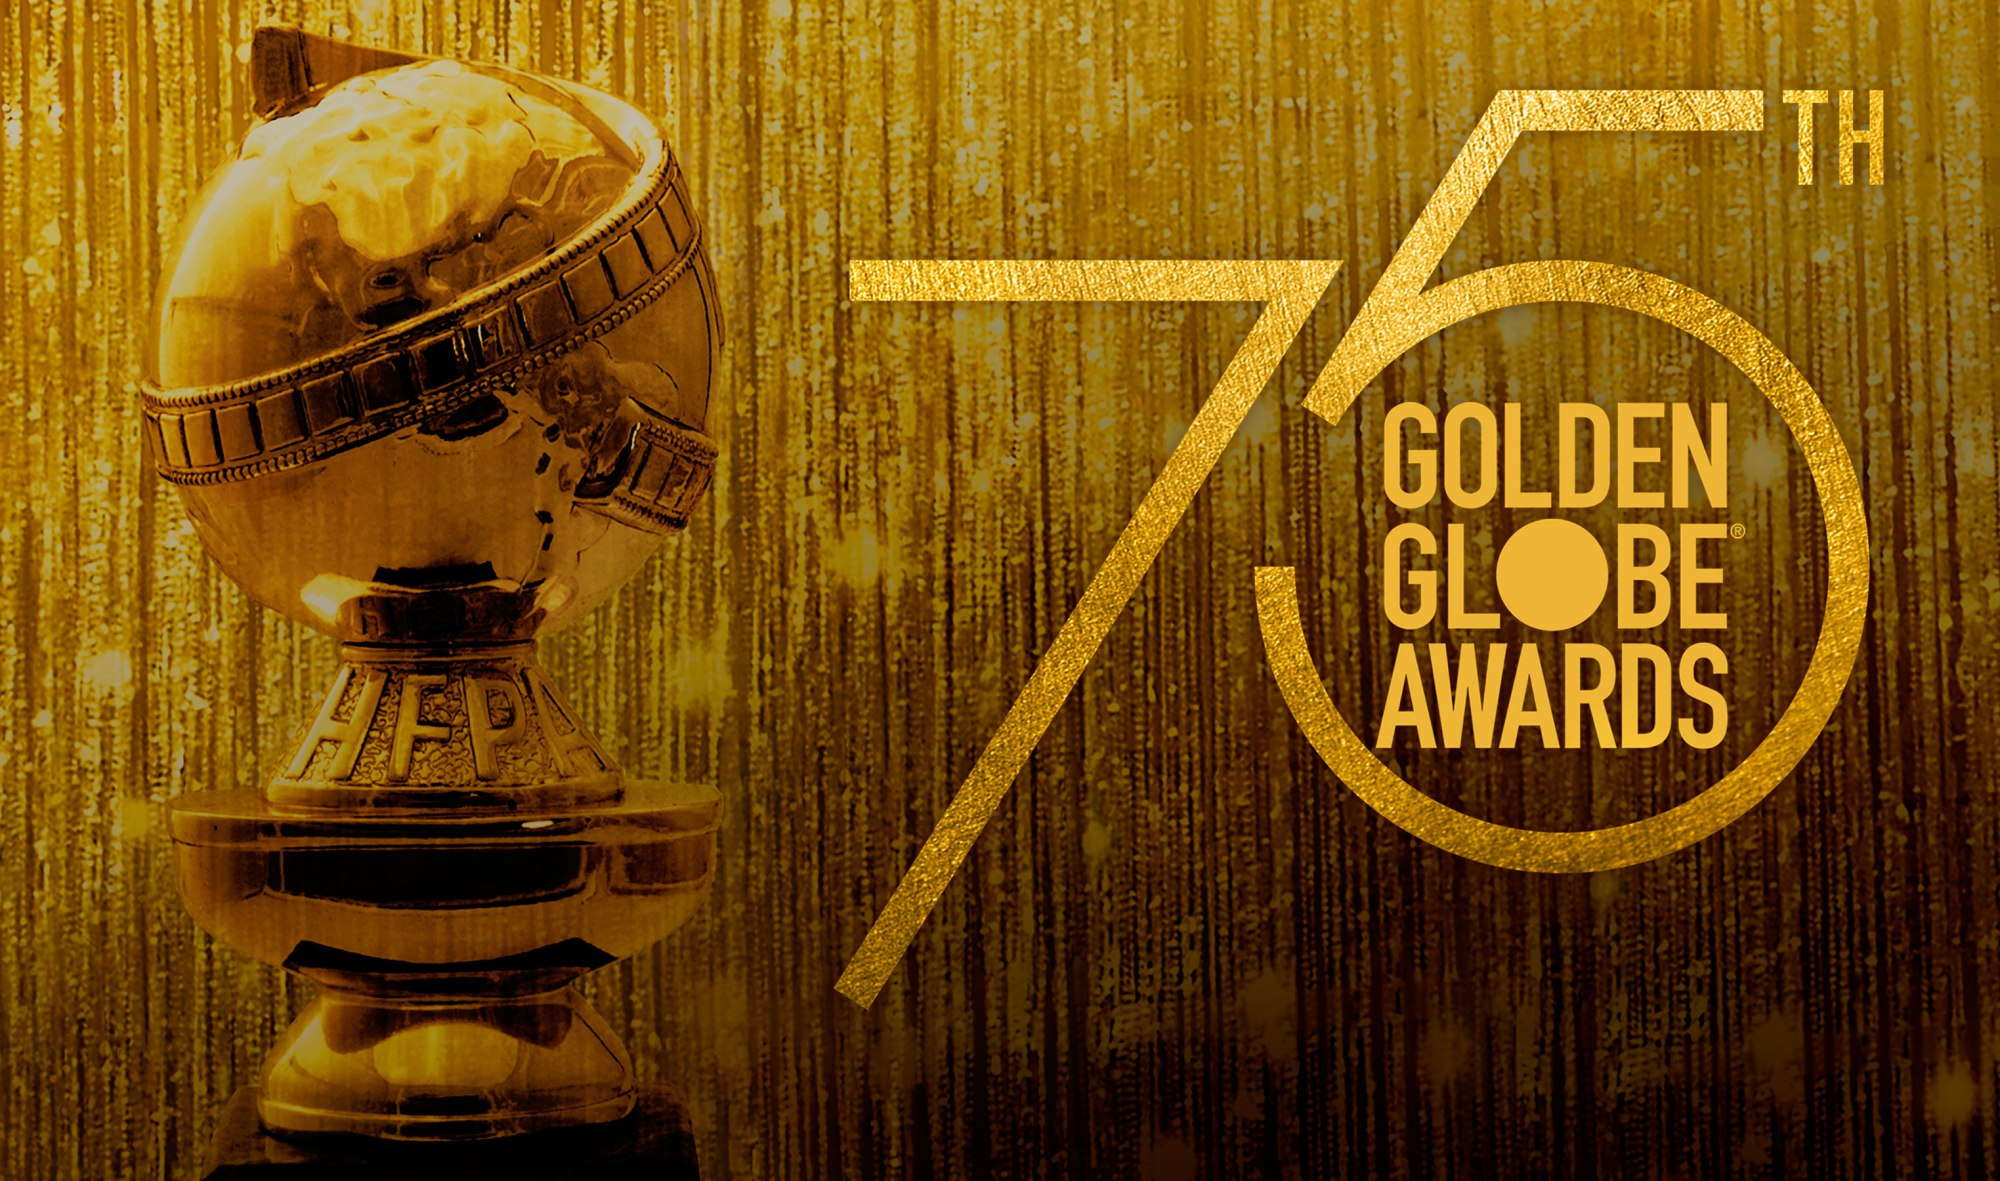 Golden Globes 2018, le nomination